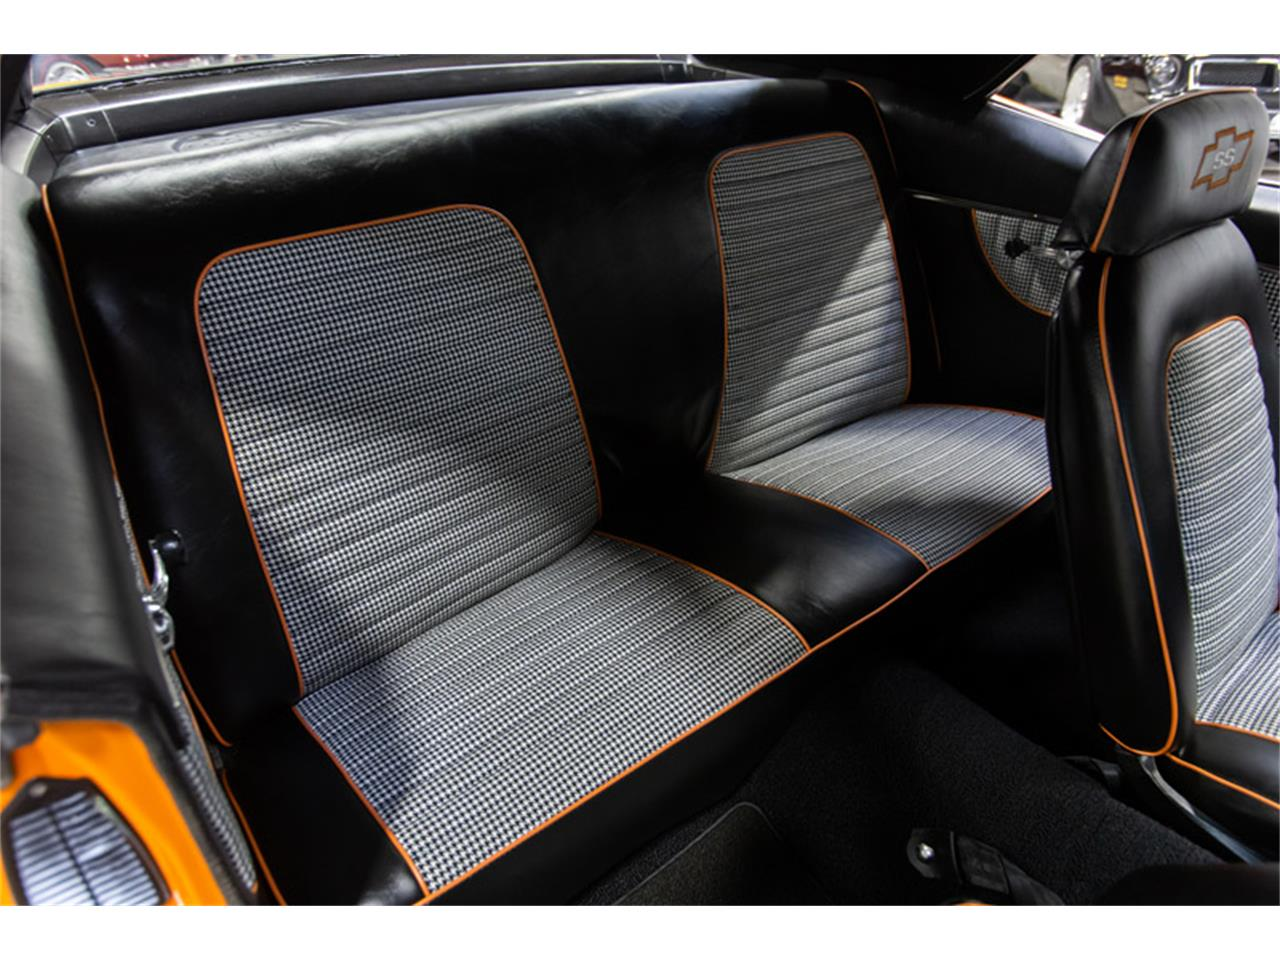 1969 Chevrolet Camaro (CC-1249099) for sale in Seekonk, Massachusetts